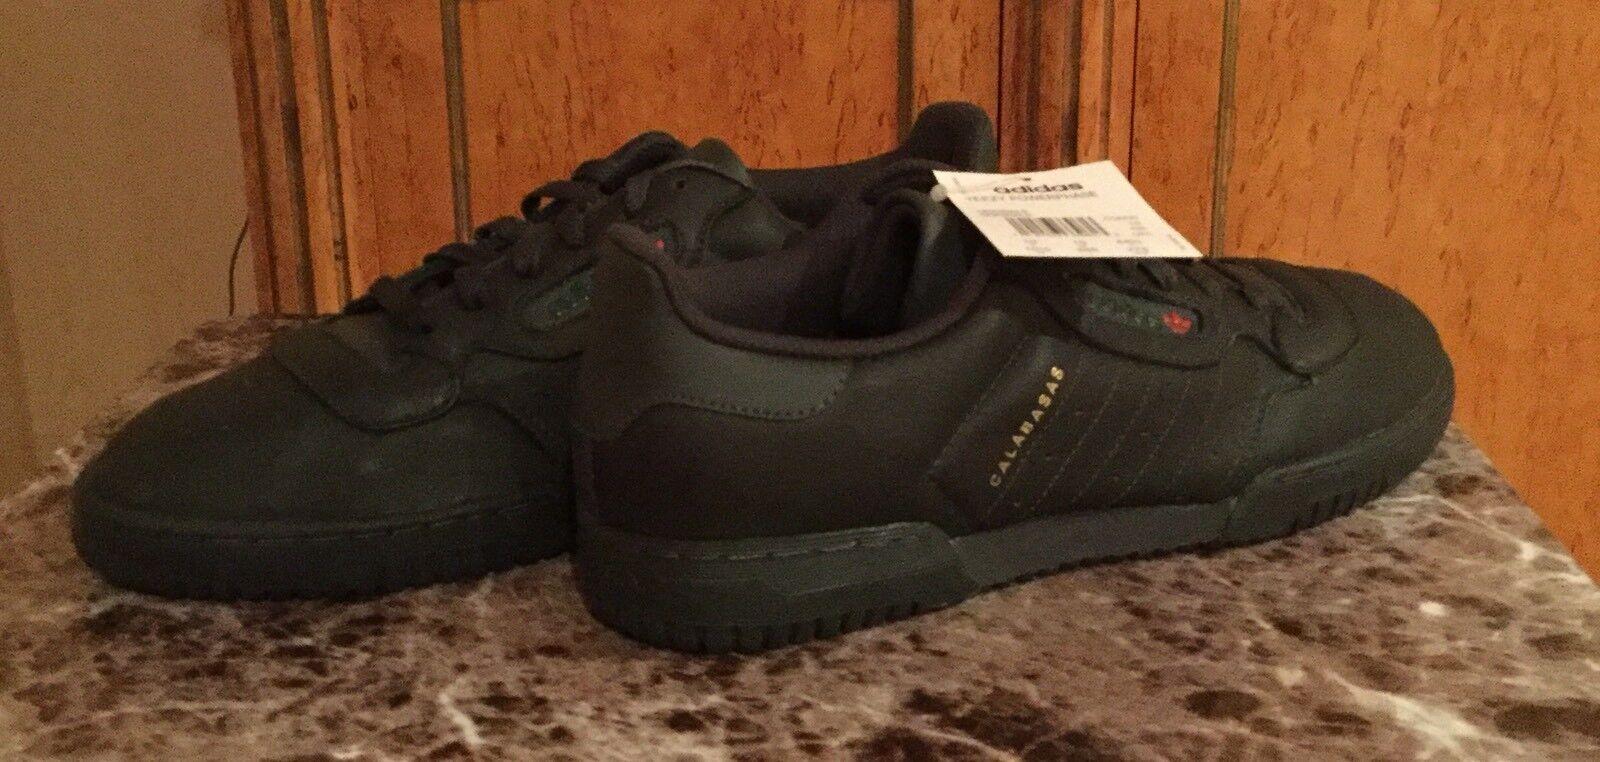 Mens Adidas Yeezy Powerphase Calabasas Sneakers, Black, Size 10.5